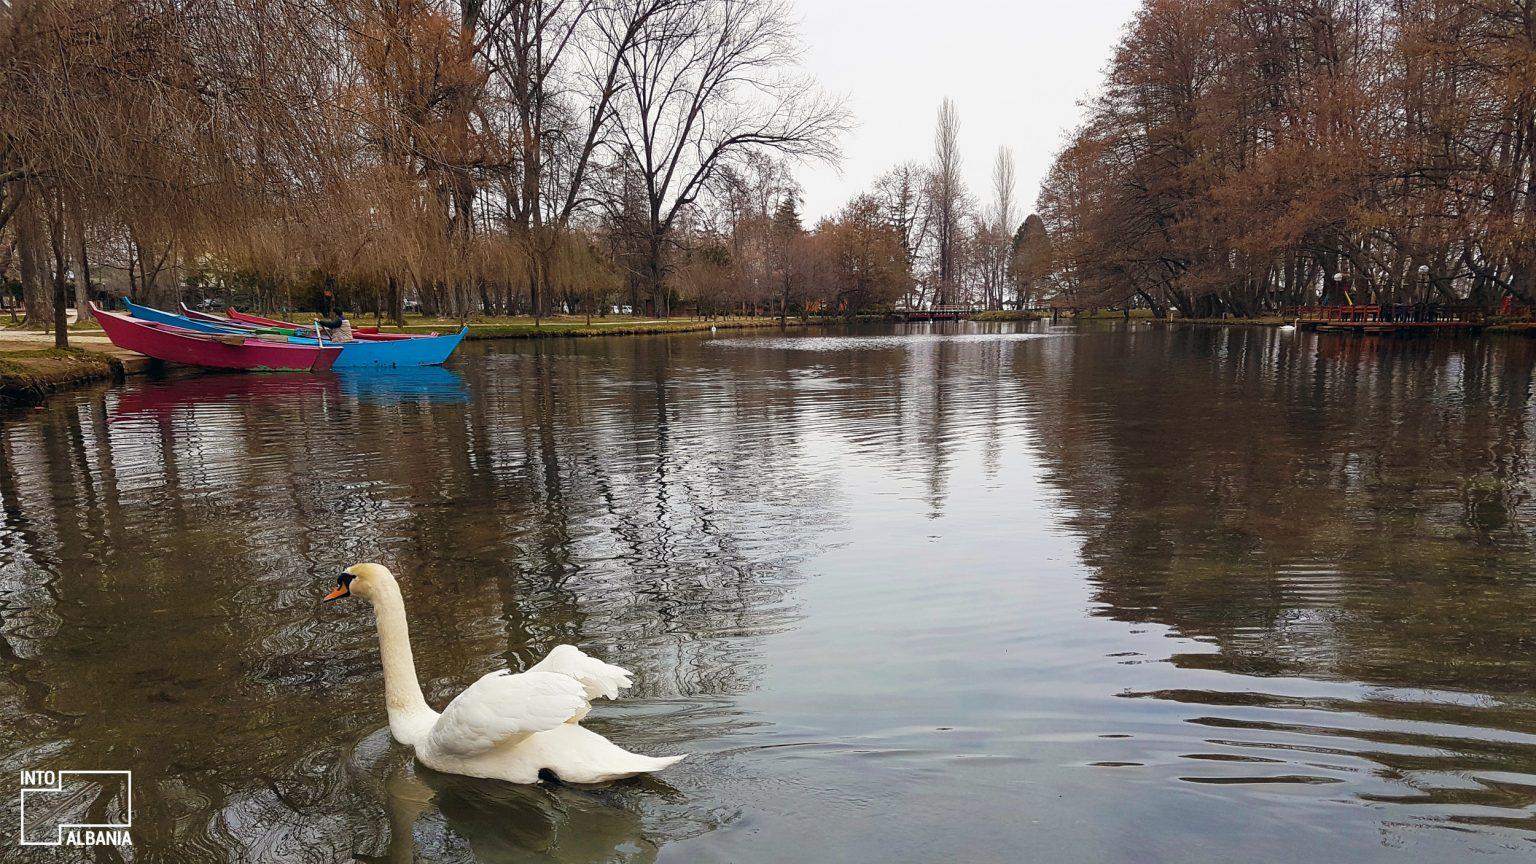 Burimet e Drilonit, Pogradec, foto nga IntoAlbania